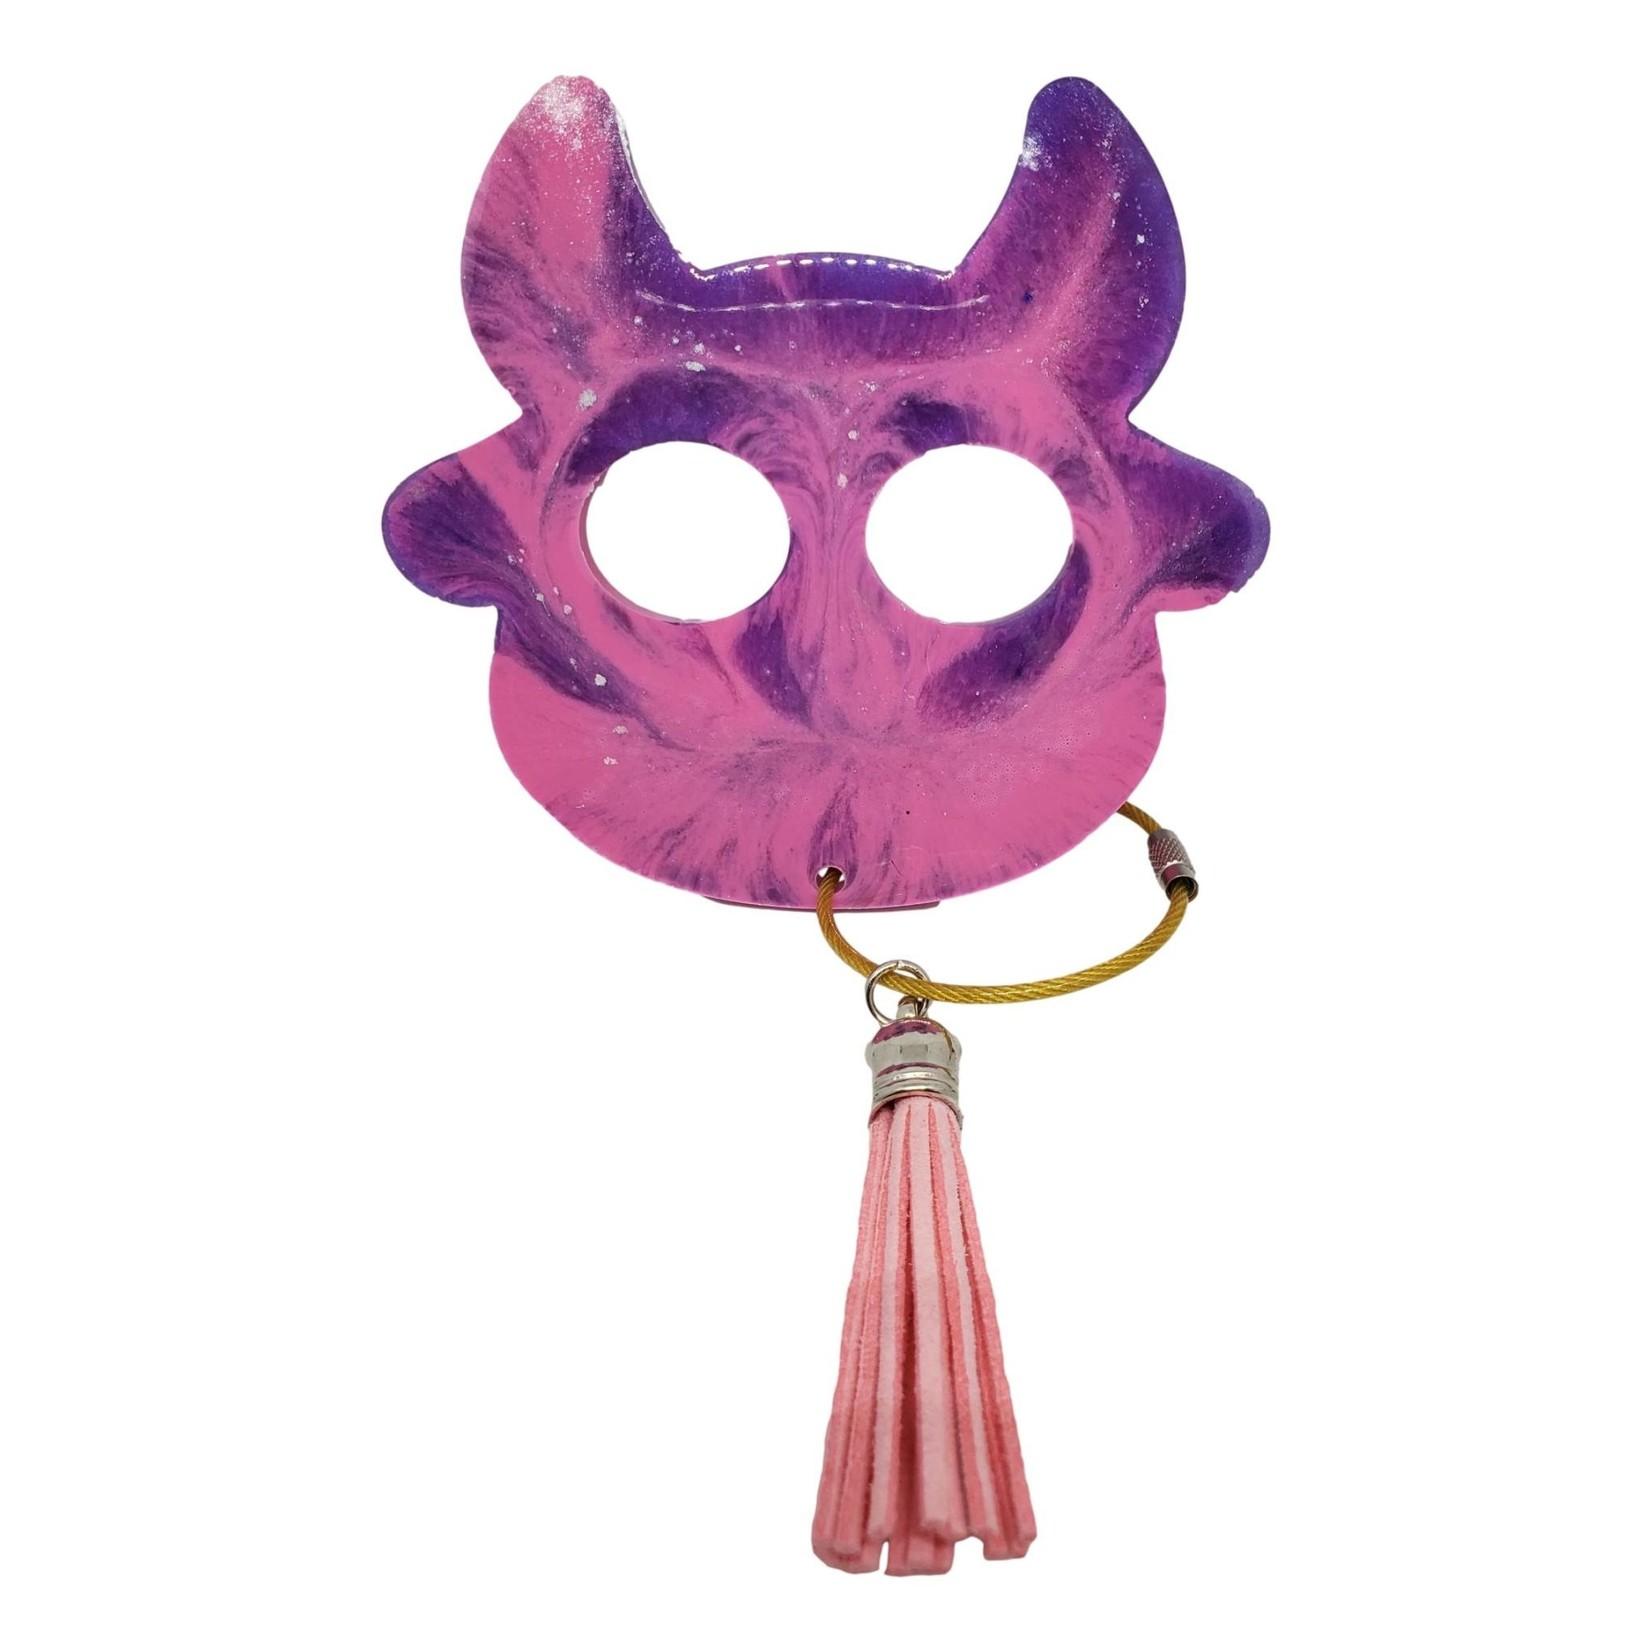 East Coast Sirens Pink & Purple Cow Keychain - Large